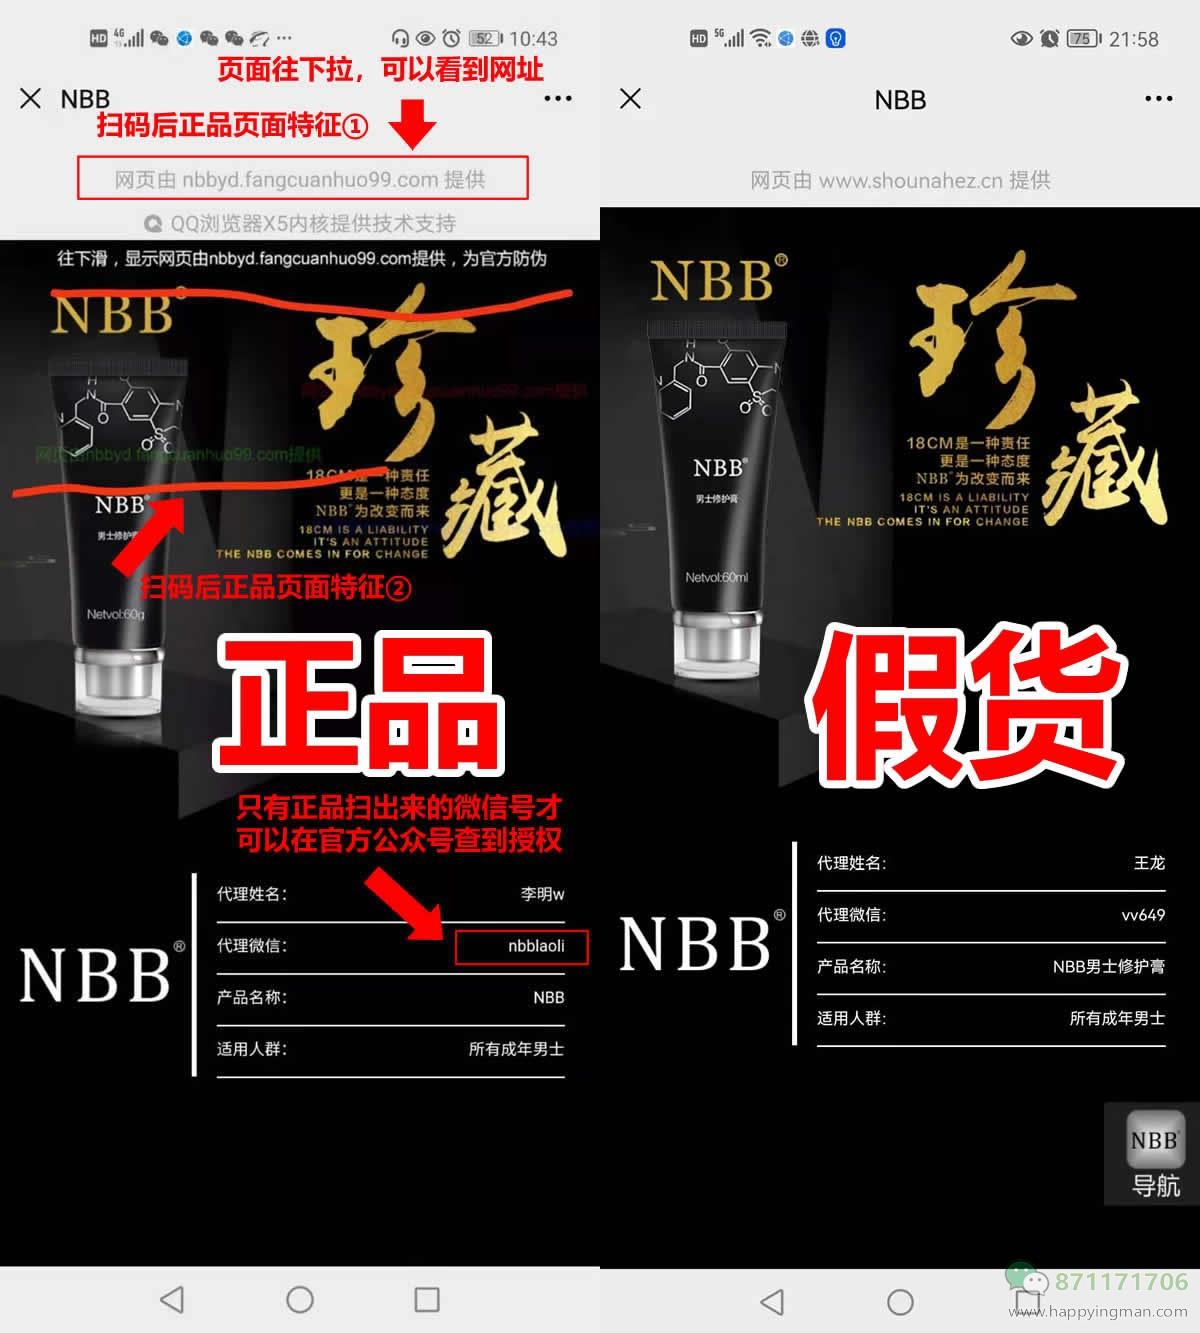 nbb正品怎么查询,nbb升级版防伪验证方法【详细步骤】